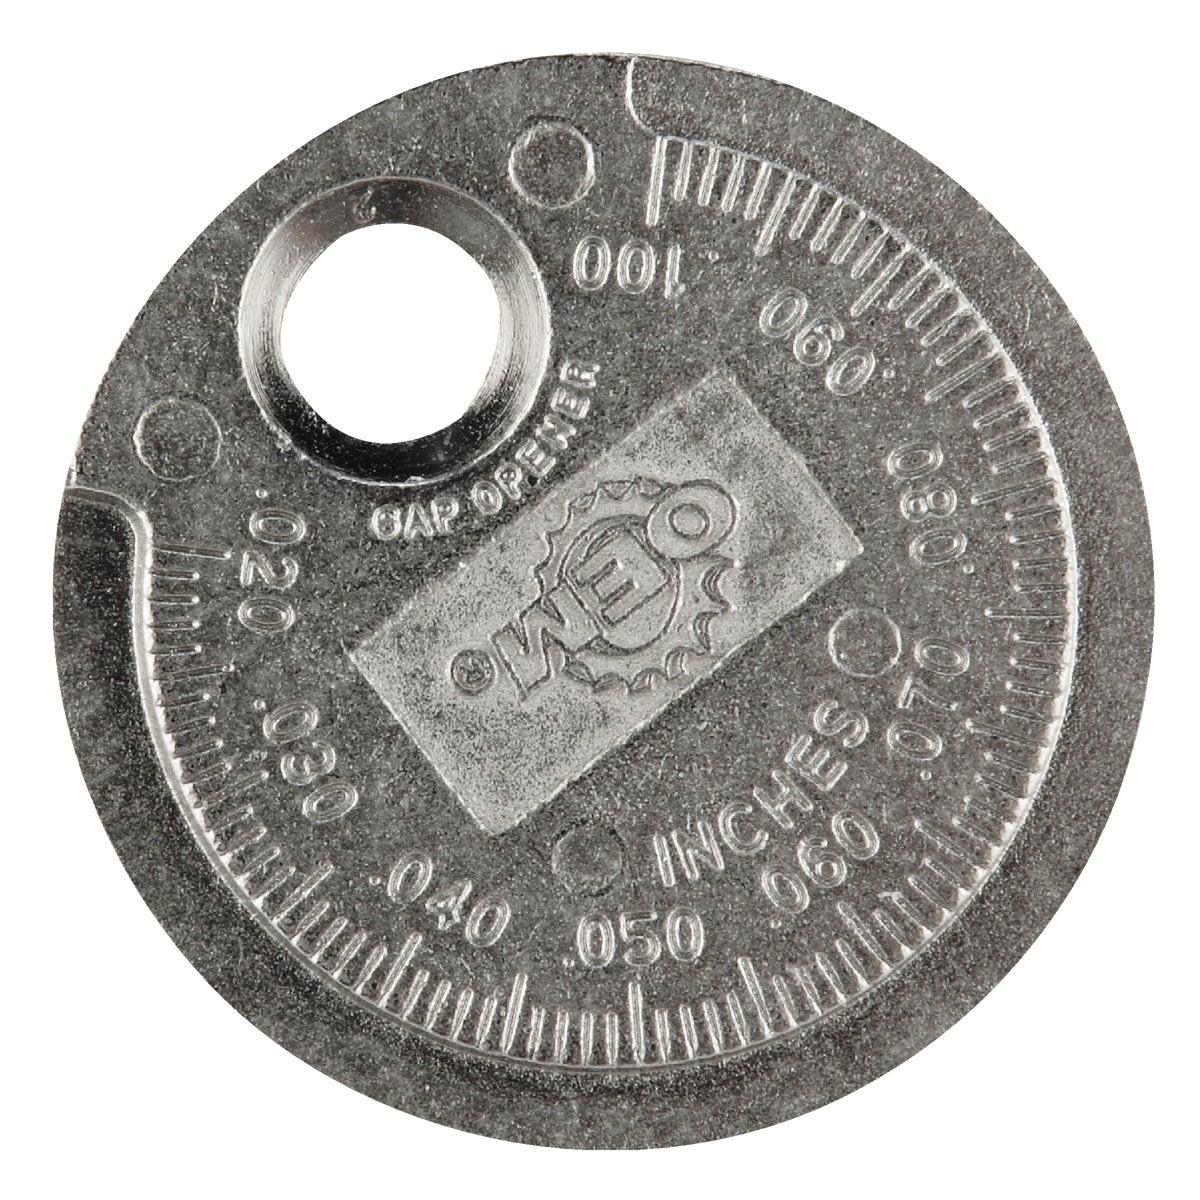 SPARK PLUG GAP GAUGE - 25352 by Great Neck Saw Inc